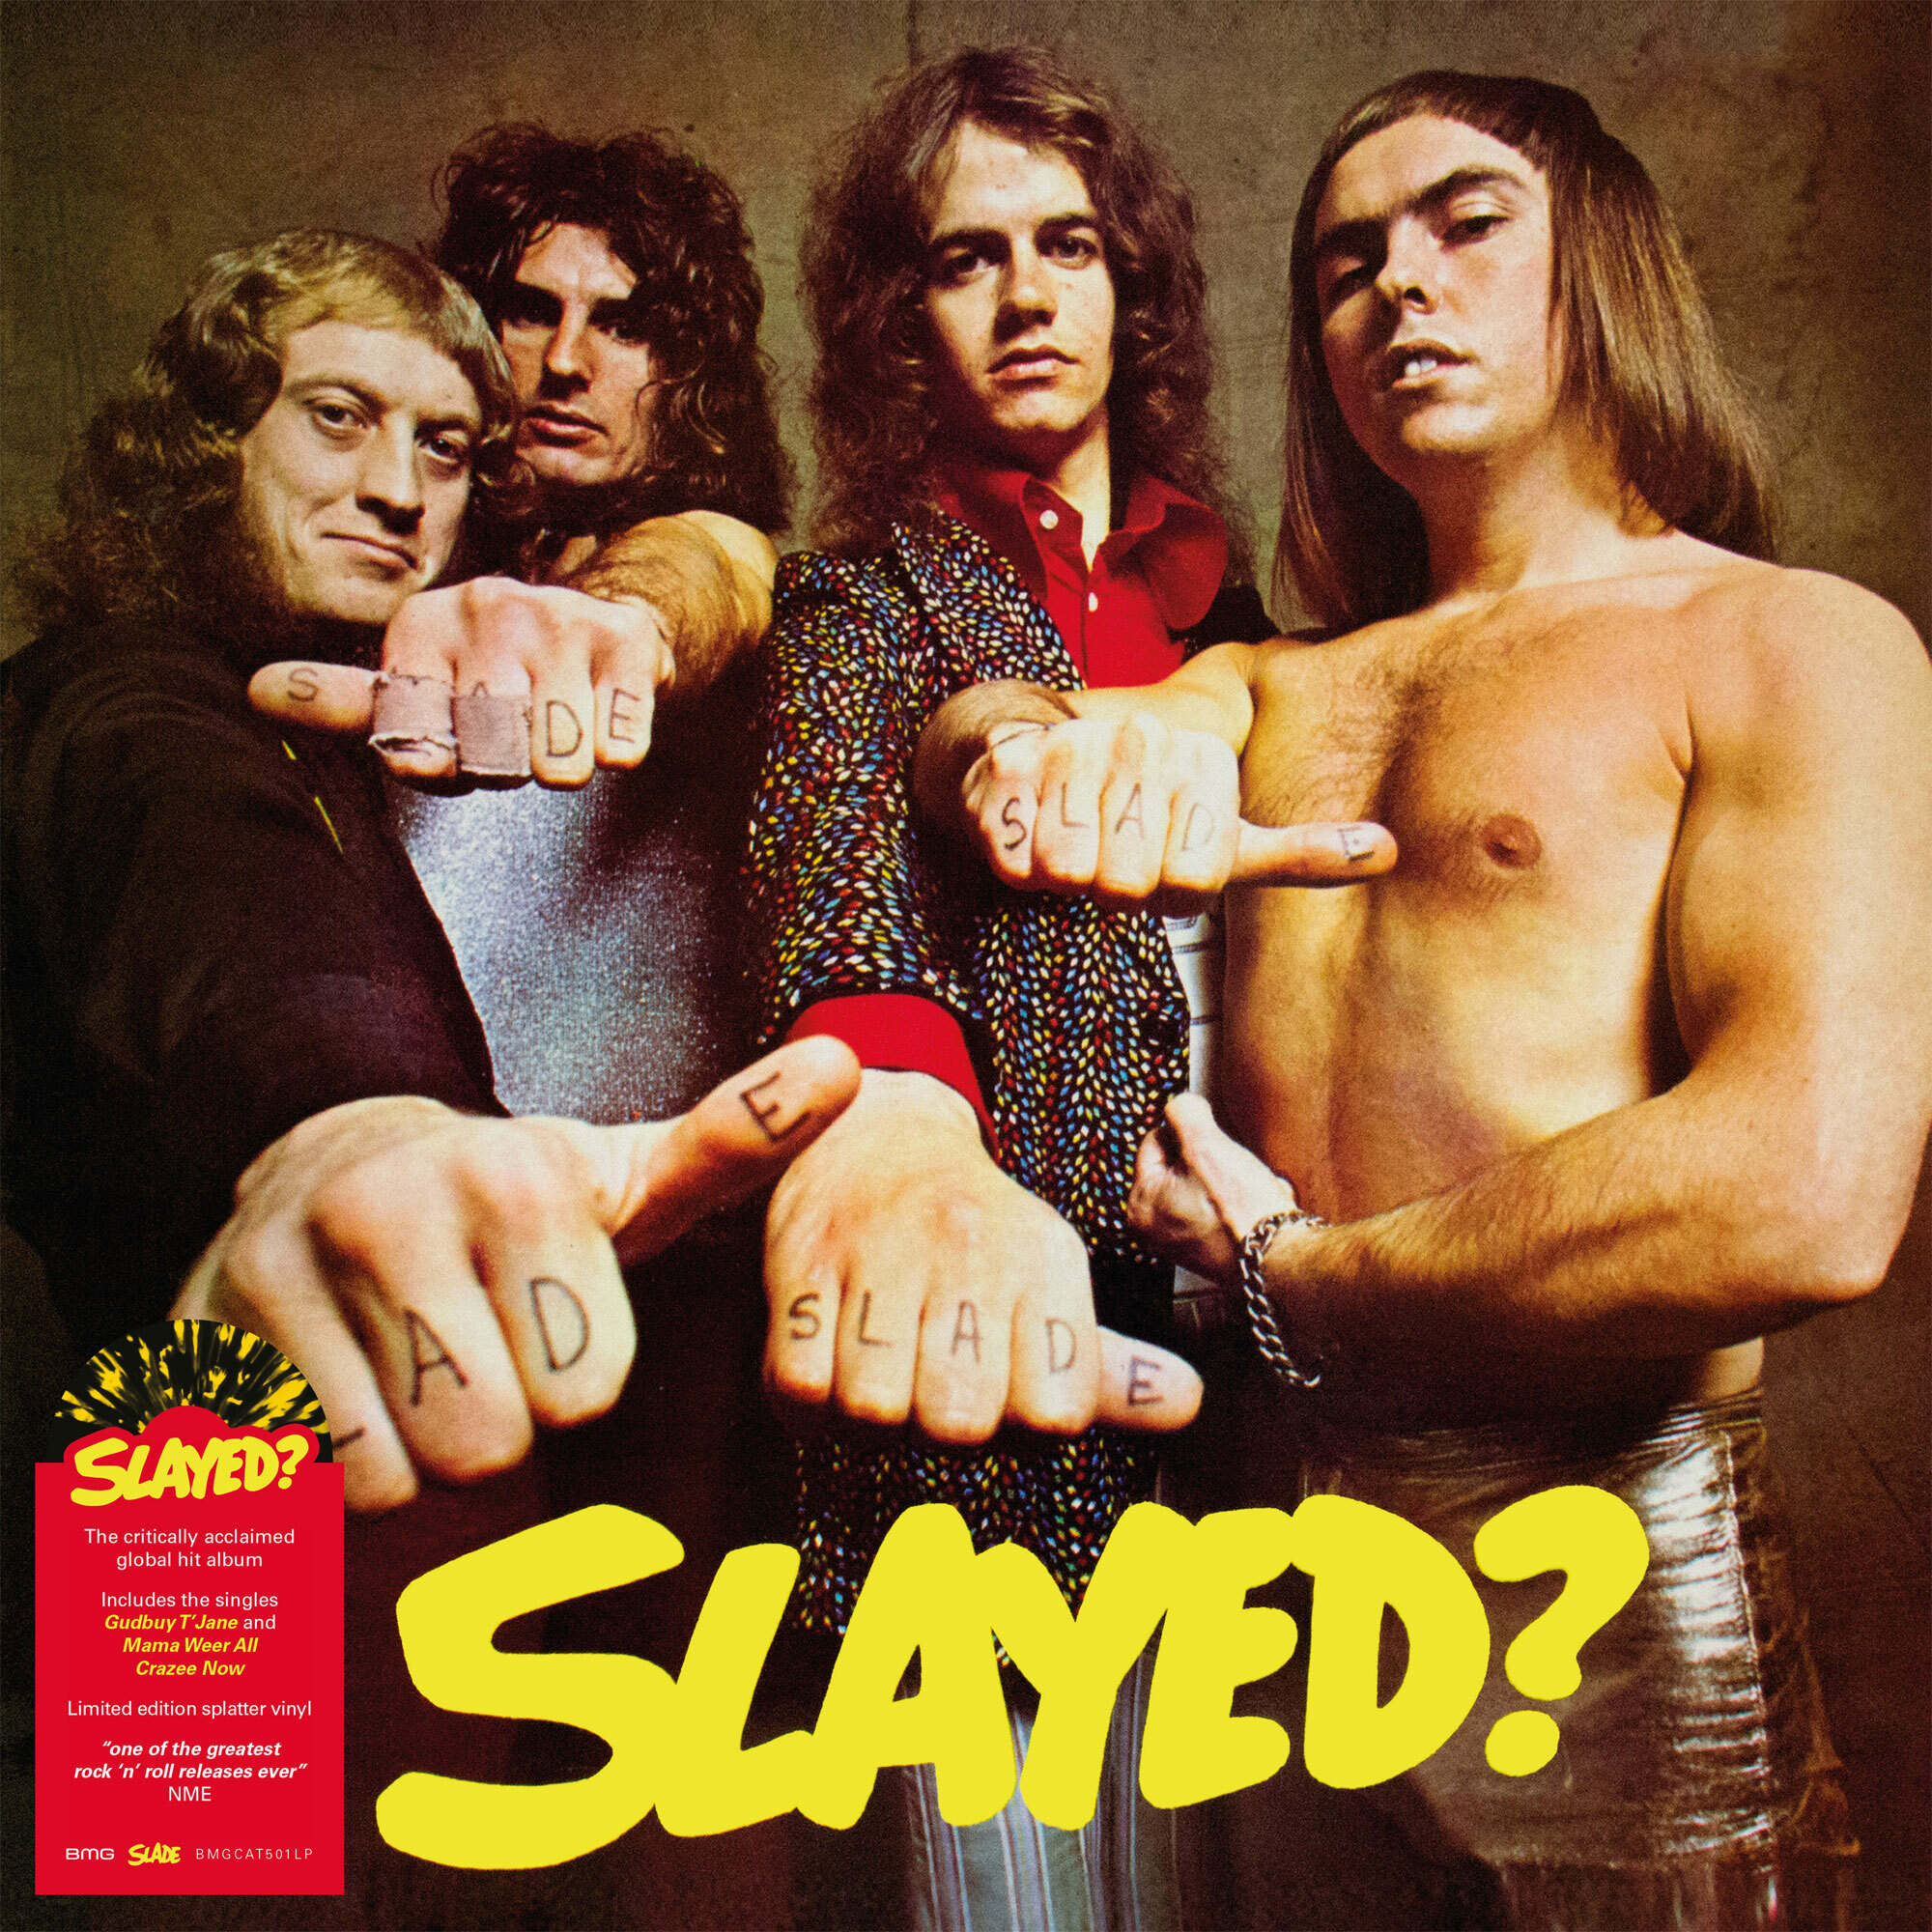 Slade - Slayed? [LP] (Coloured vinyl)